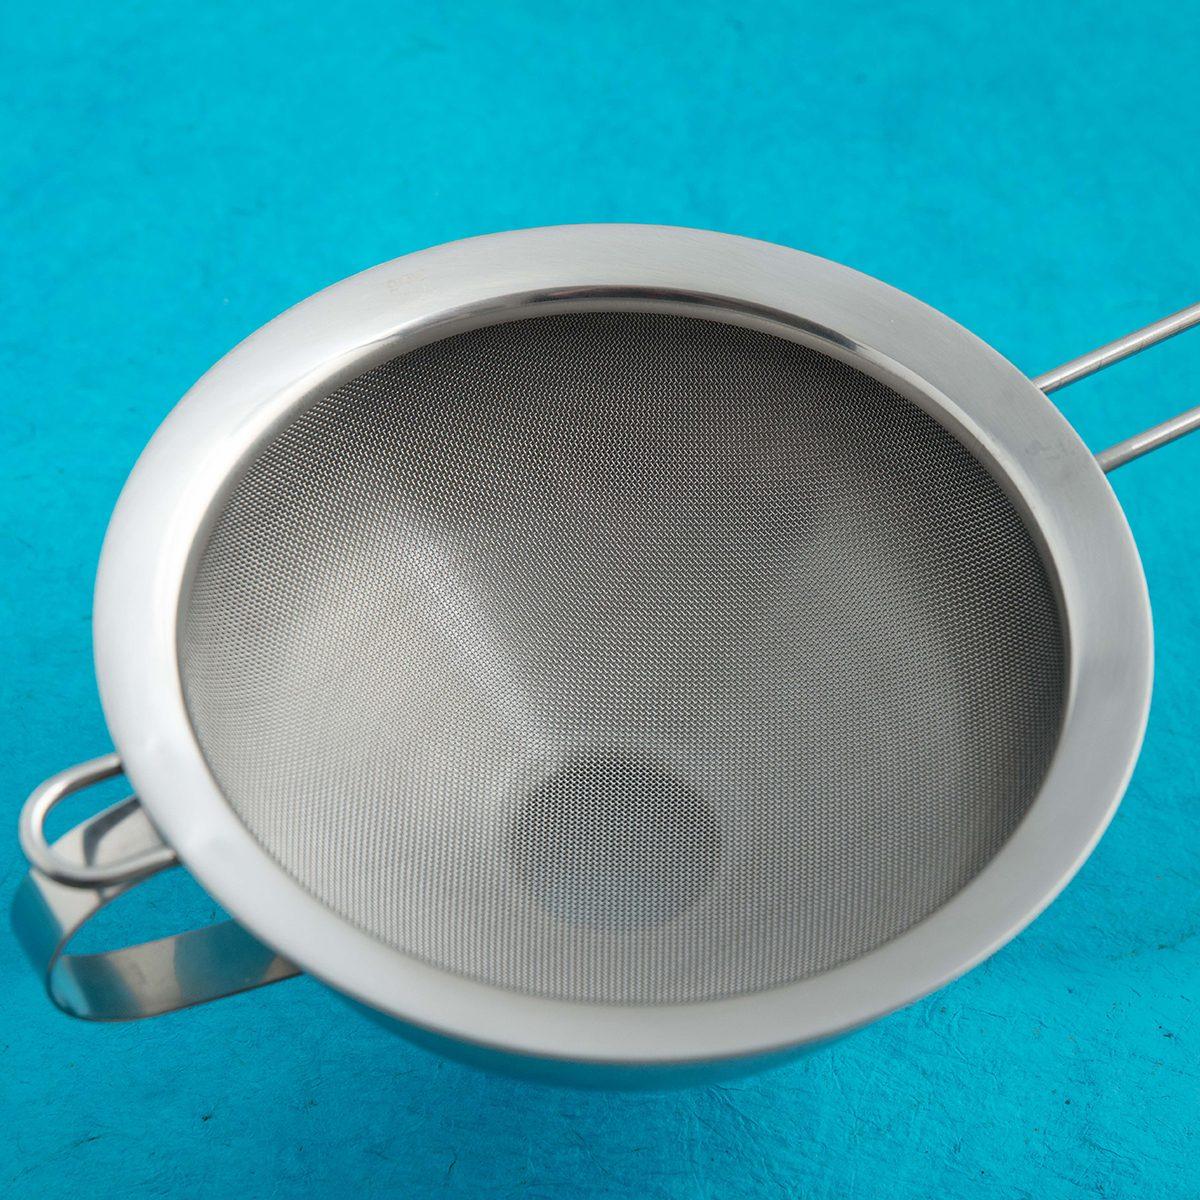 Stainless steel funnel with sieve insert. Blue kitchen background.